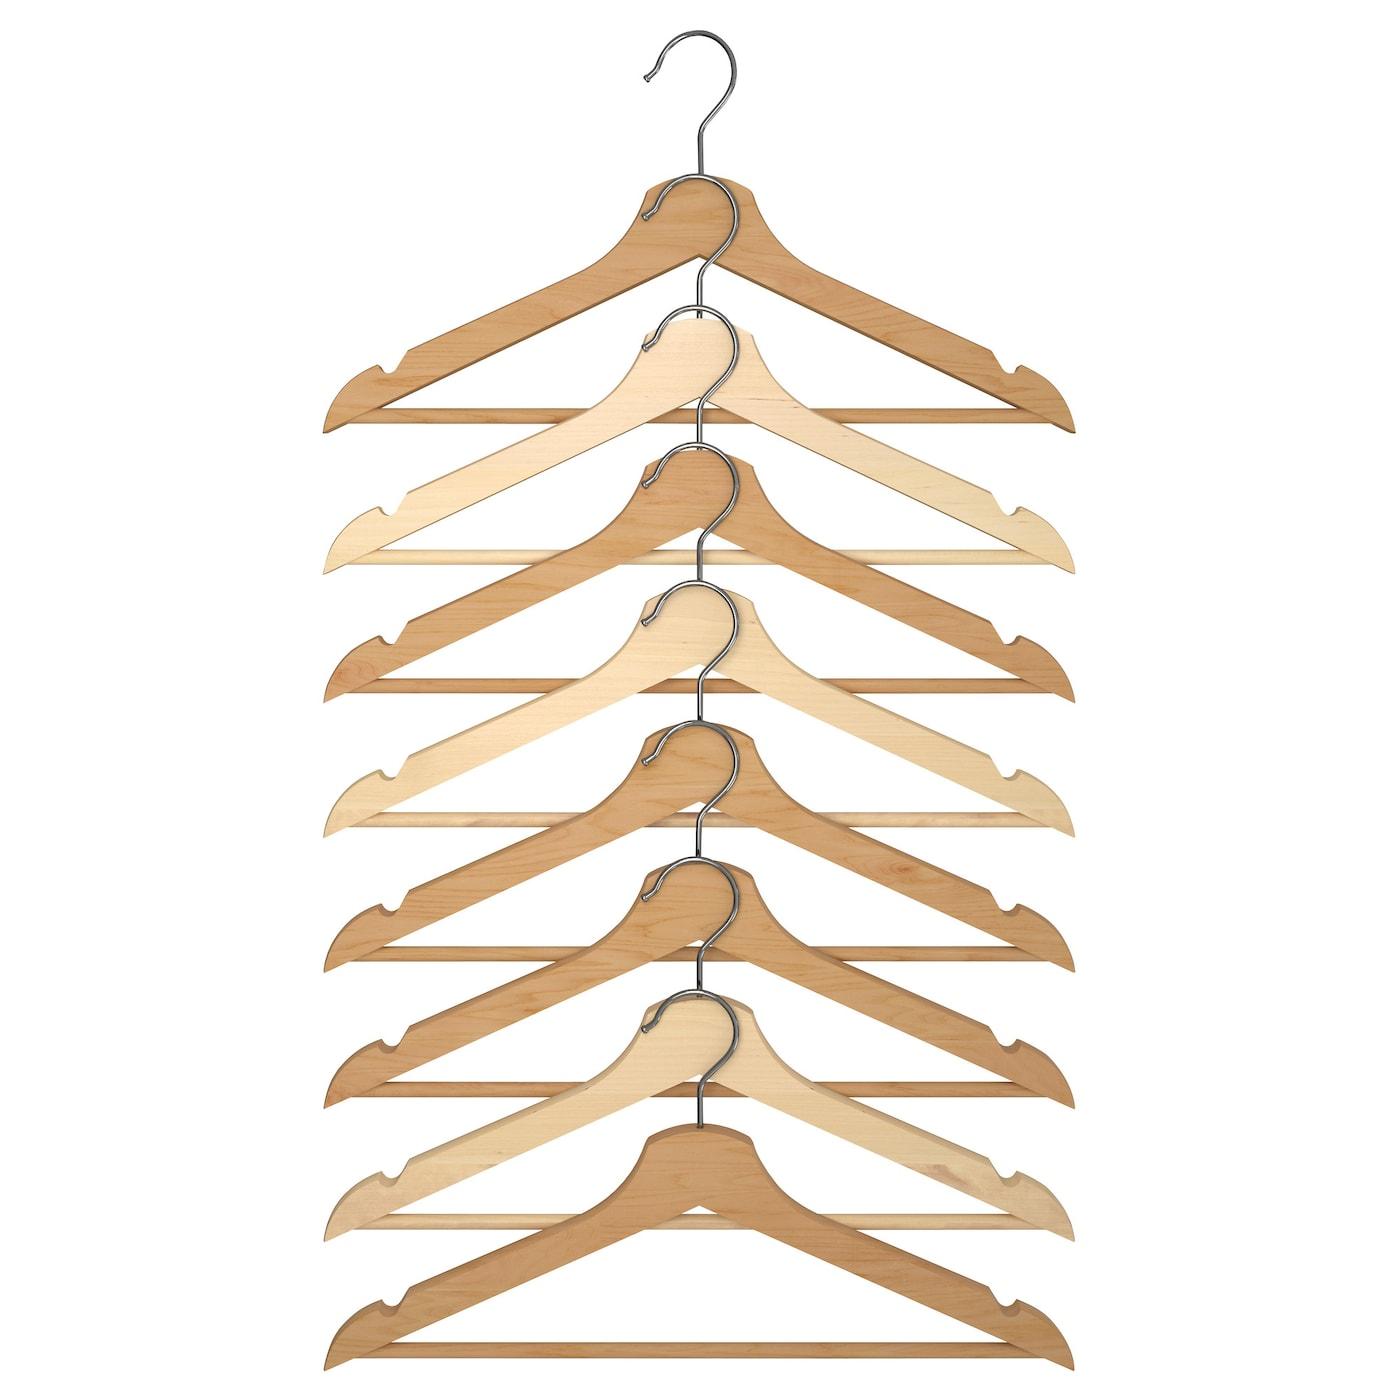 pax wardrobe instructions pdf